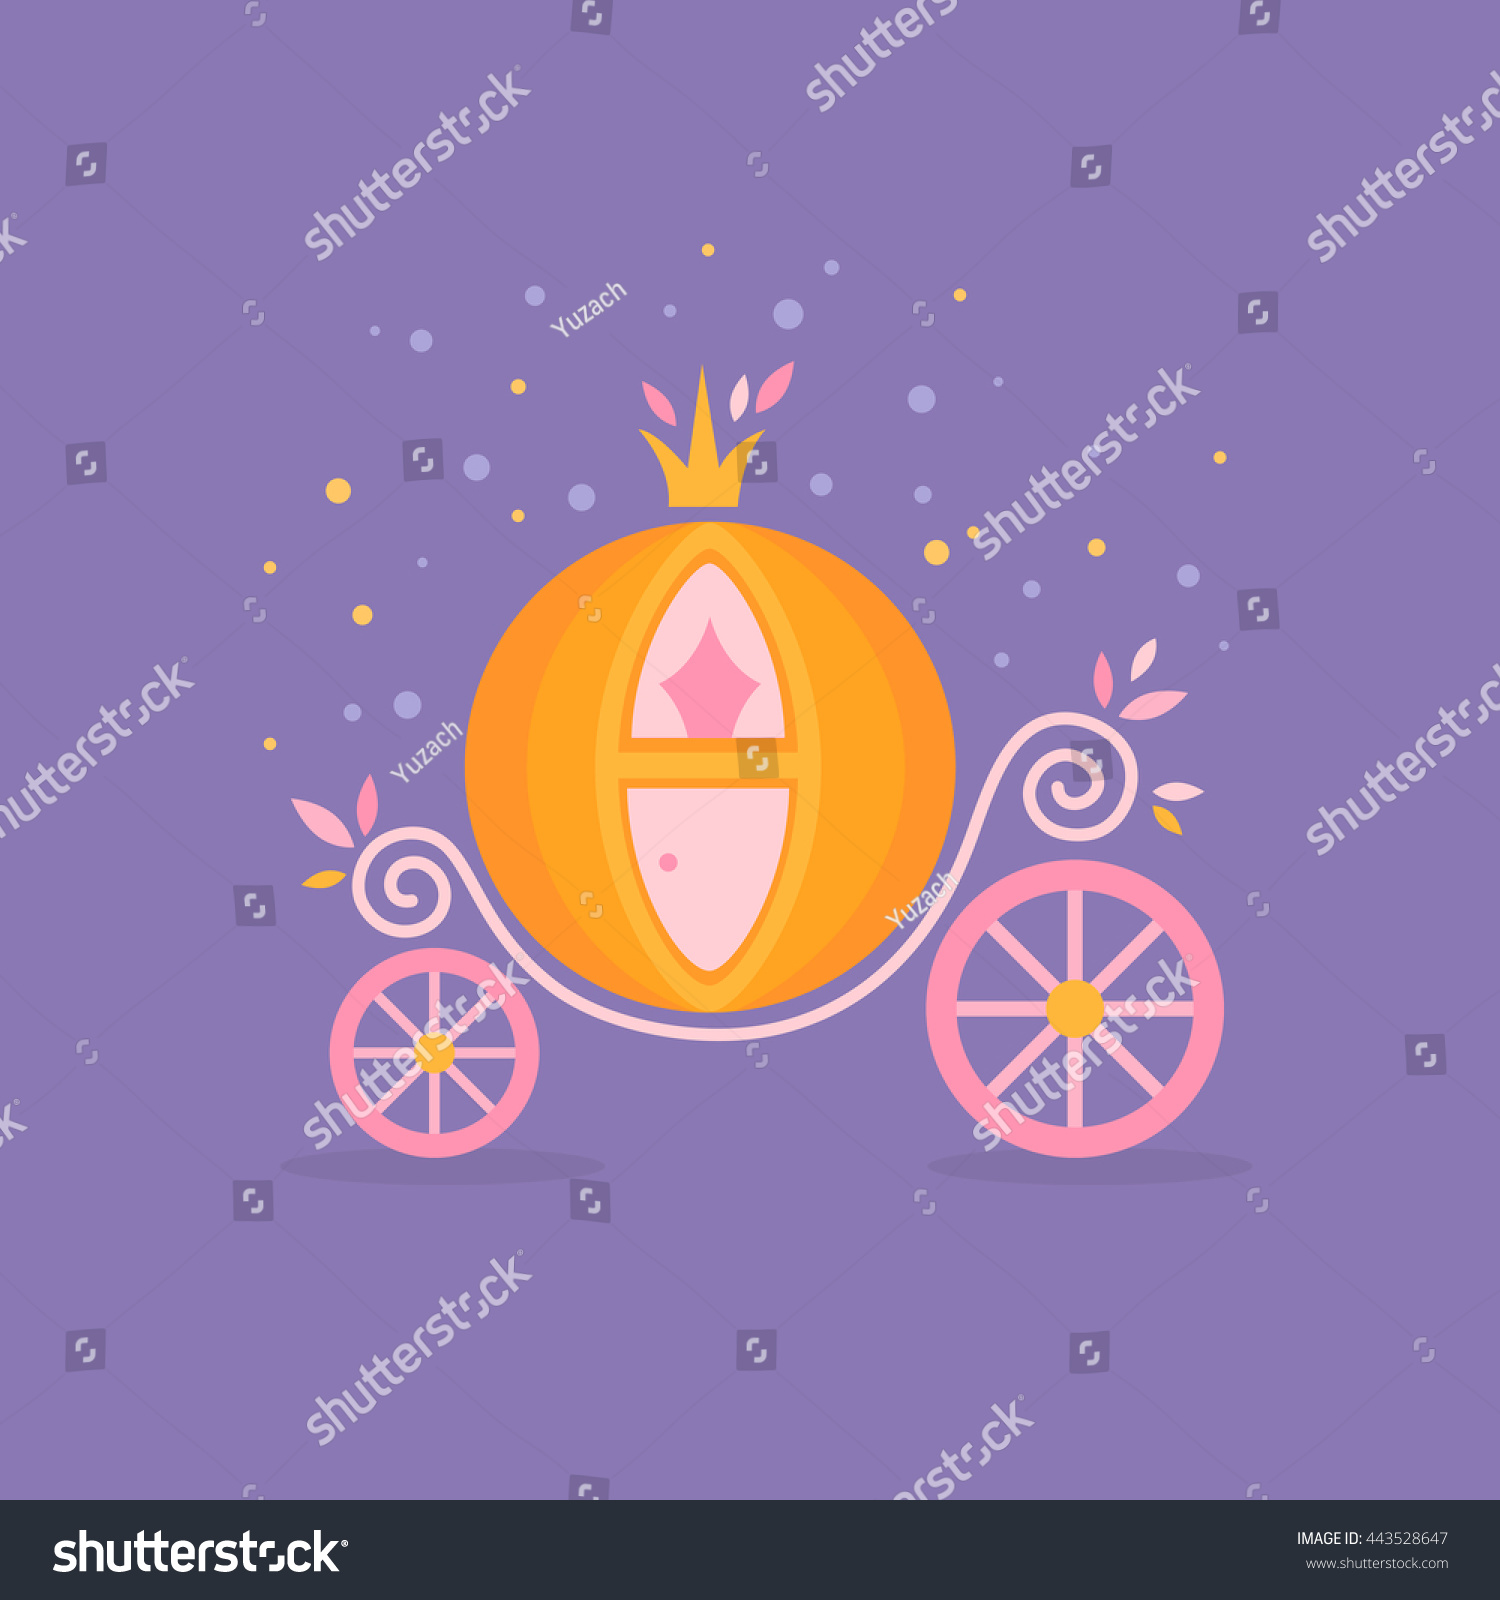 Cinderella Dresses Stock Vector Illustration Of Isolated: Pumpkin Carriage Cinderella Cartoon Fairytale Flat Stock